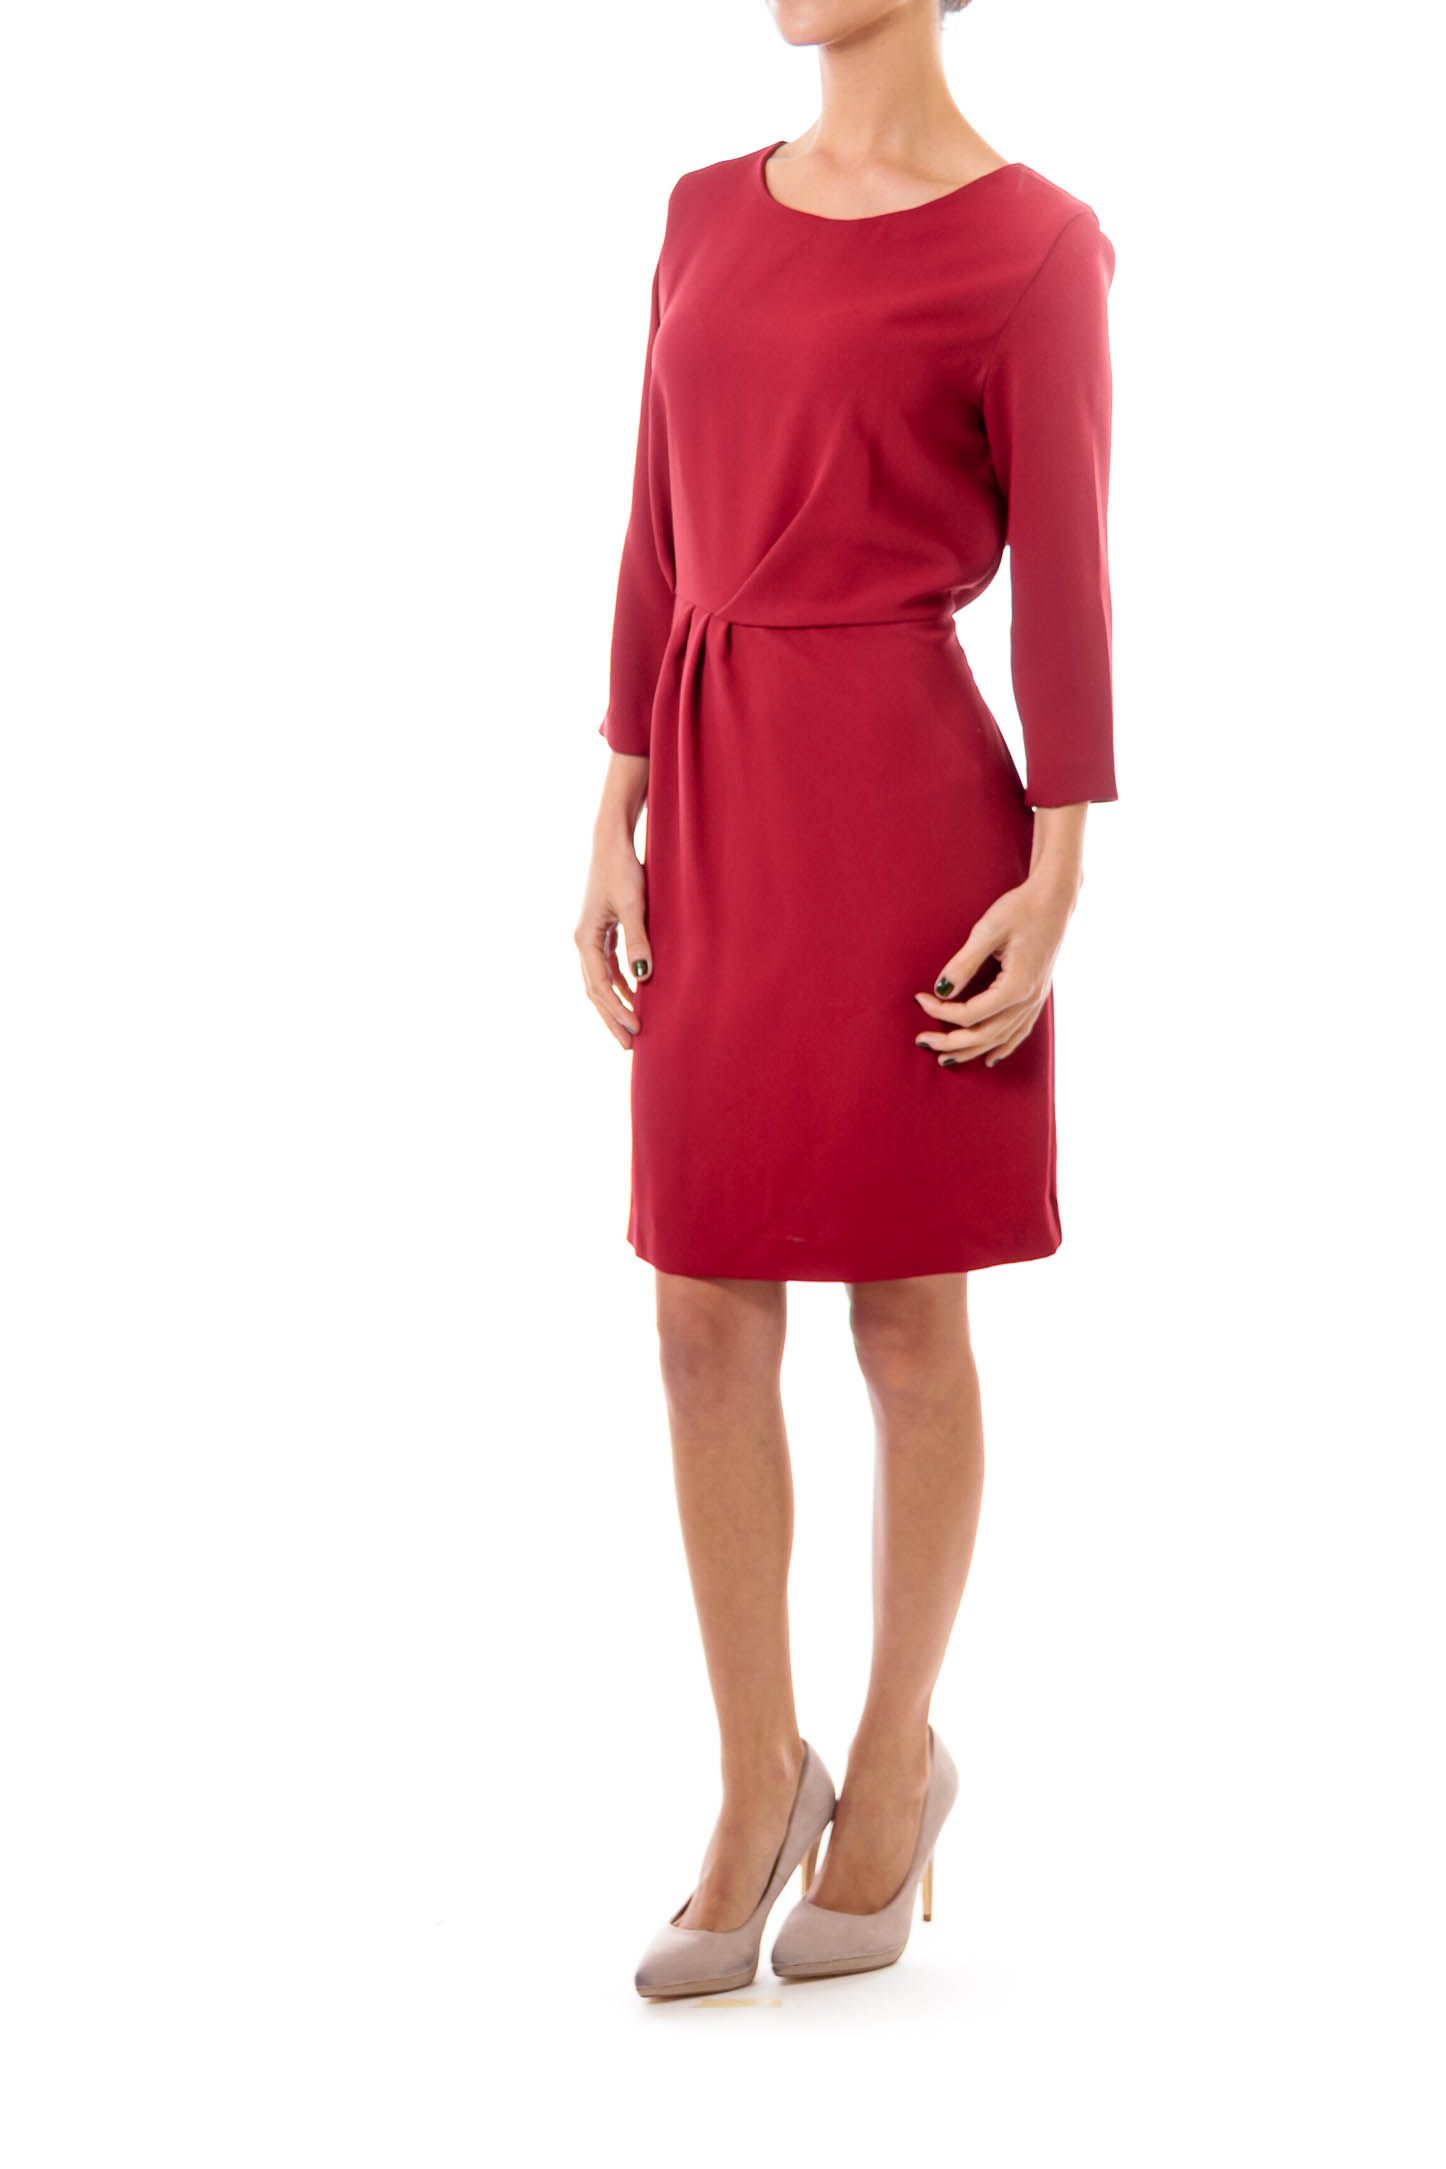 Maroon Sheath Dress